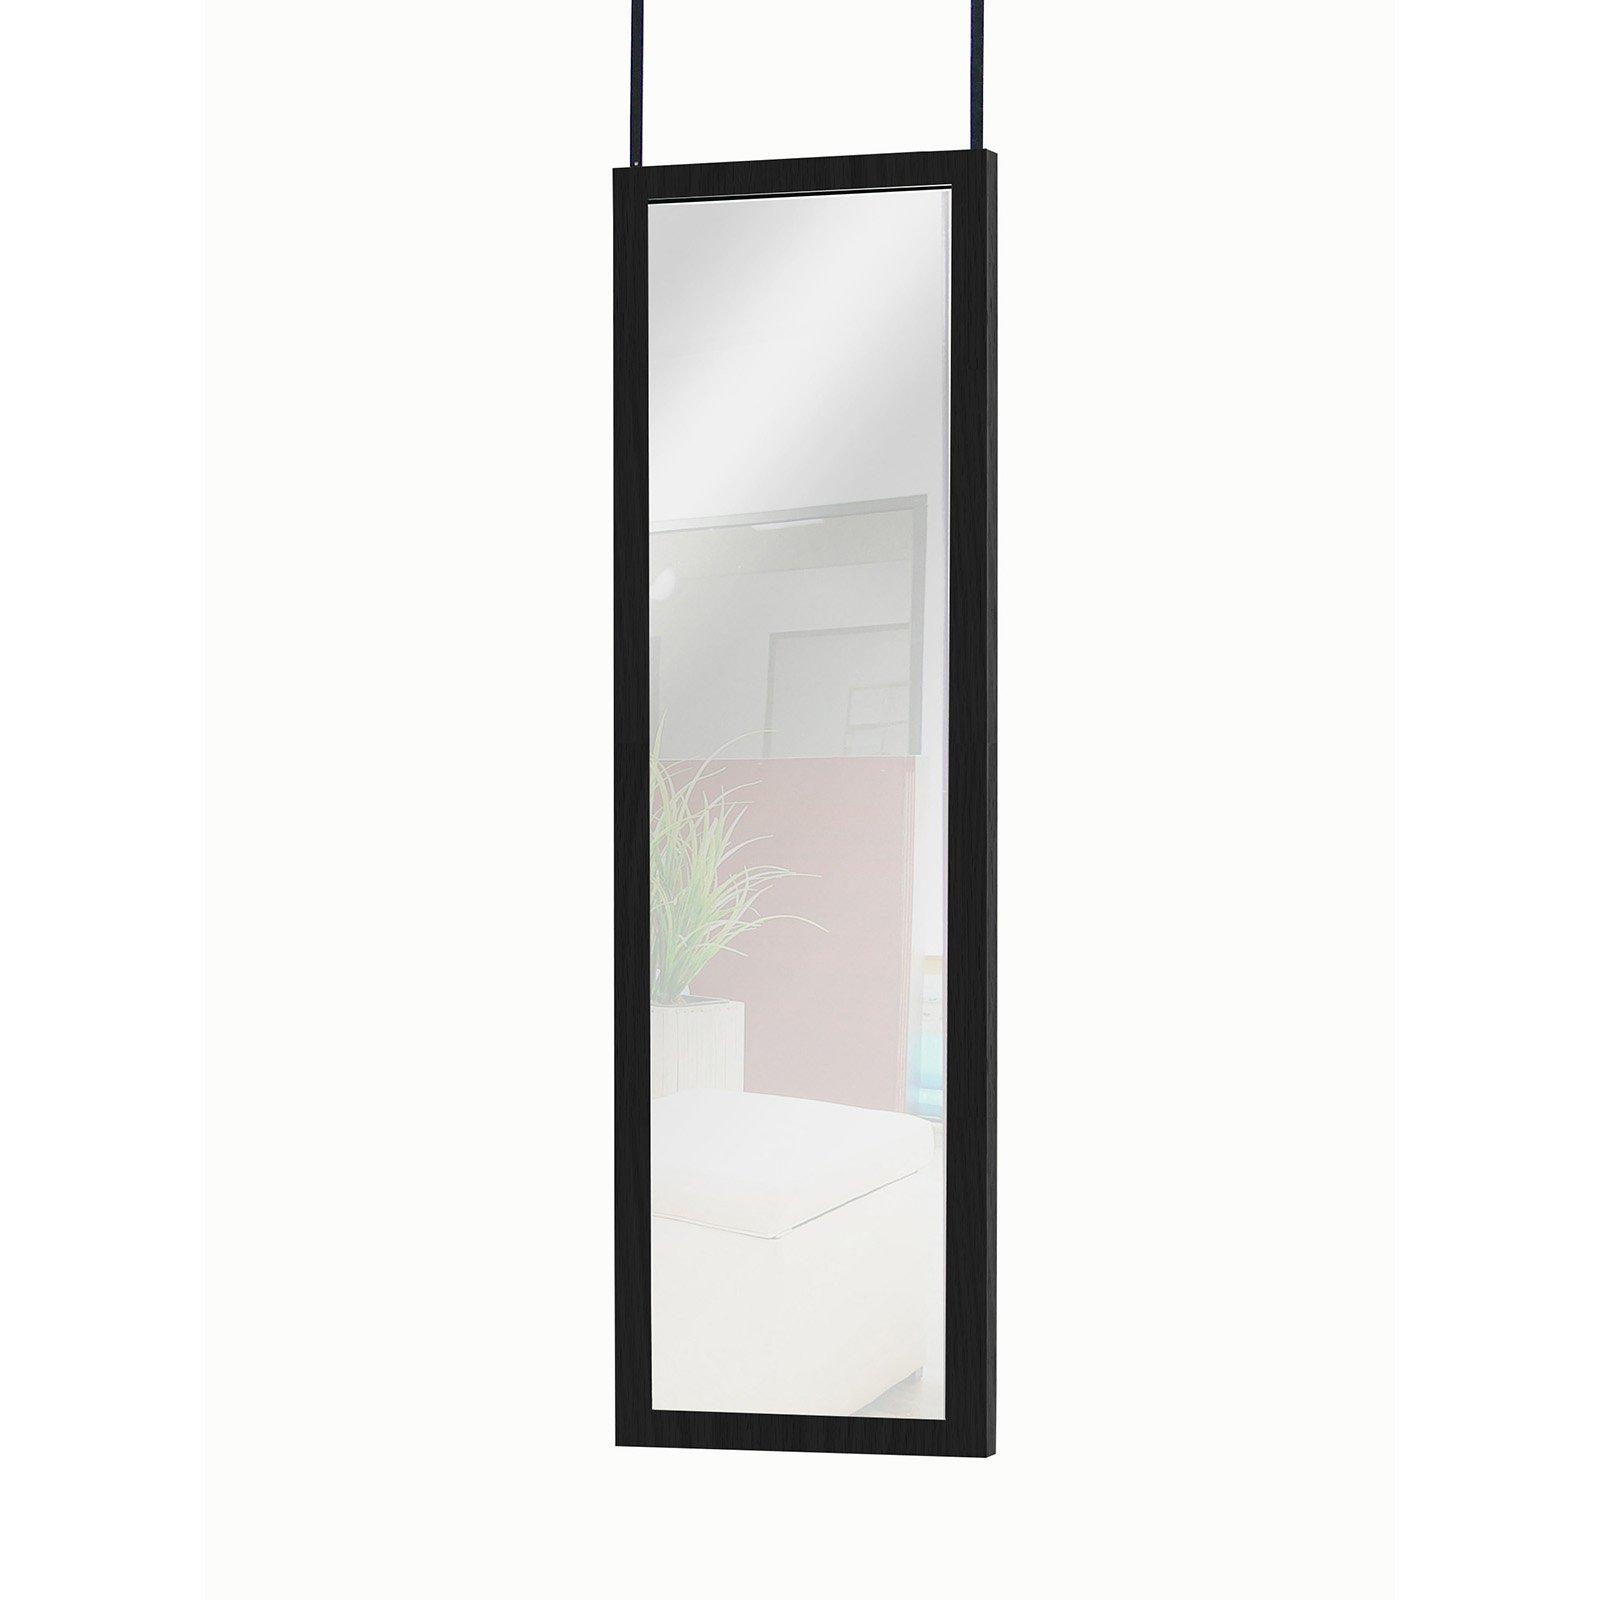 Mirrotek Over the Door / Wall Mounted Full Length Dressing Mirror